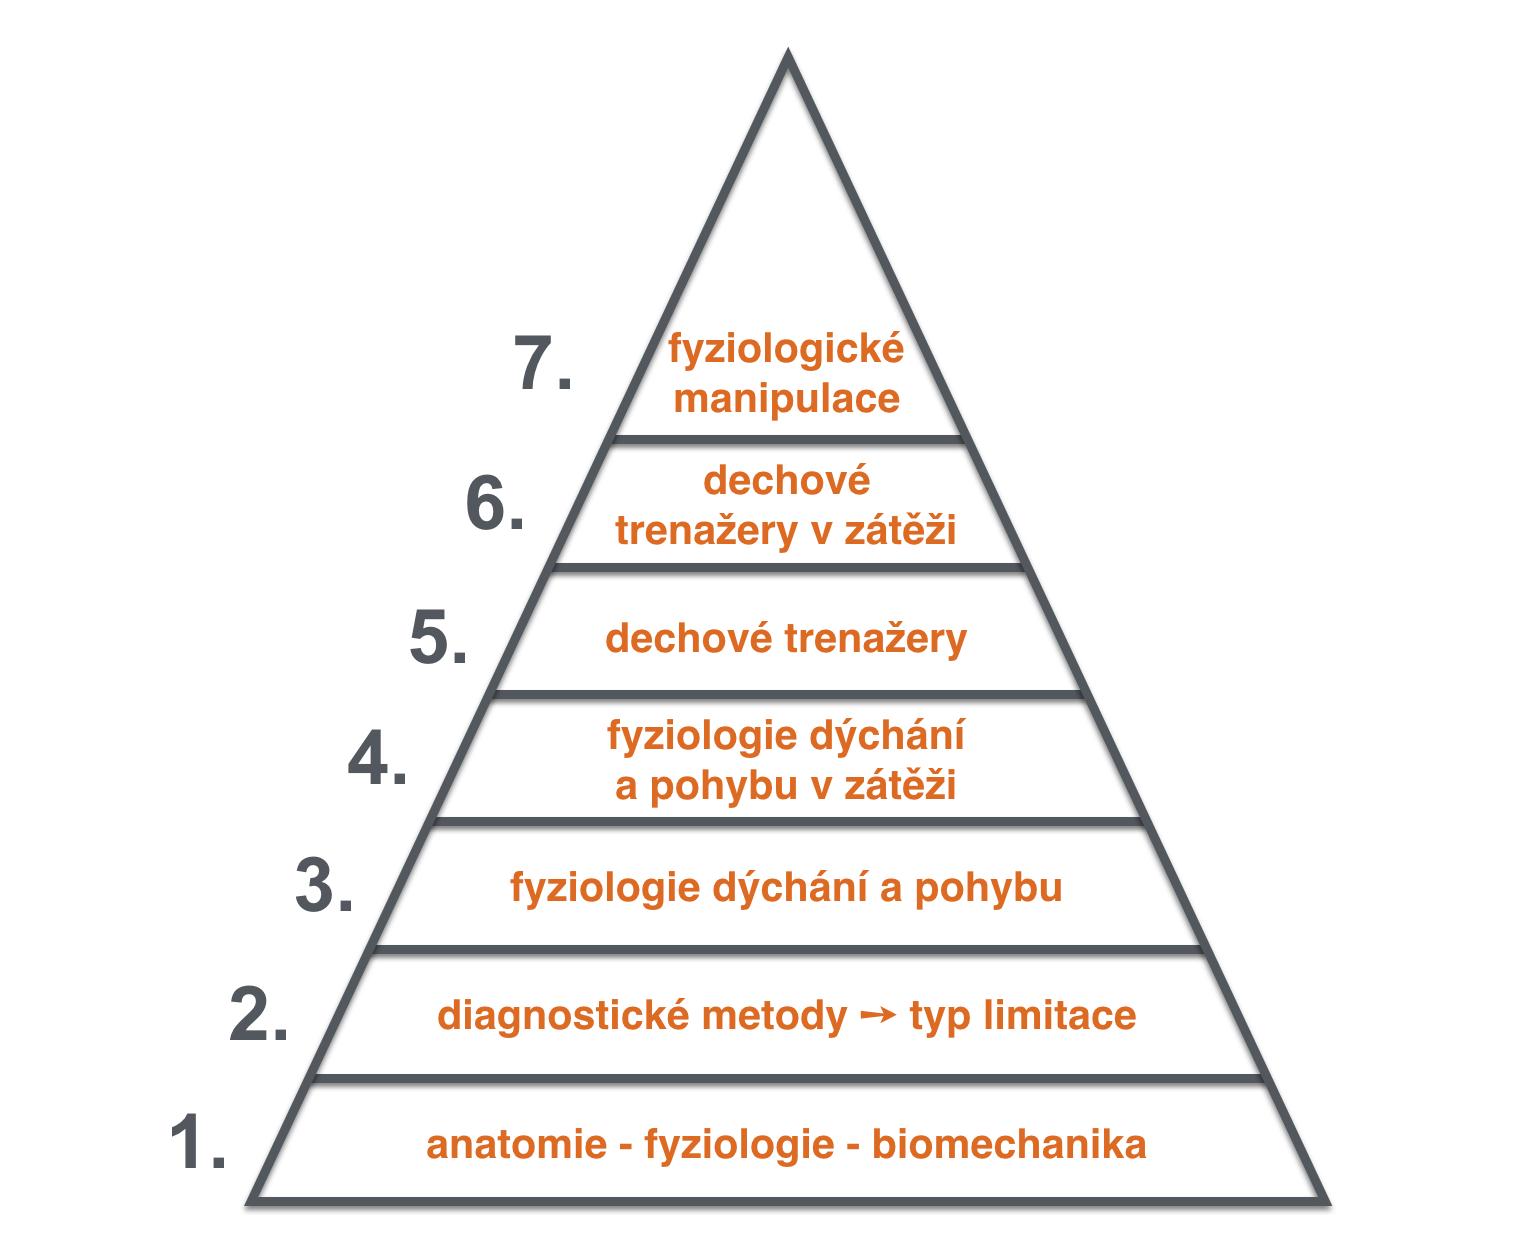 FRT pyramida 1.png